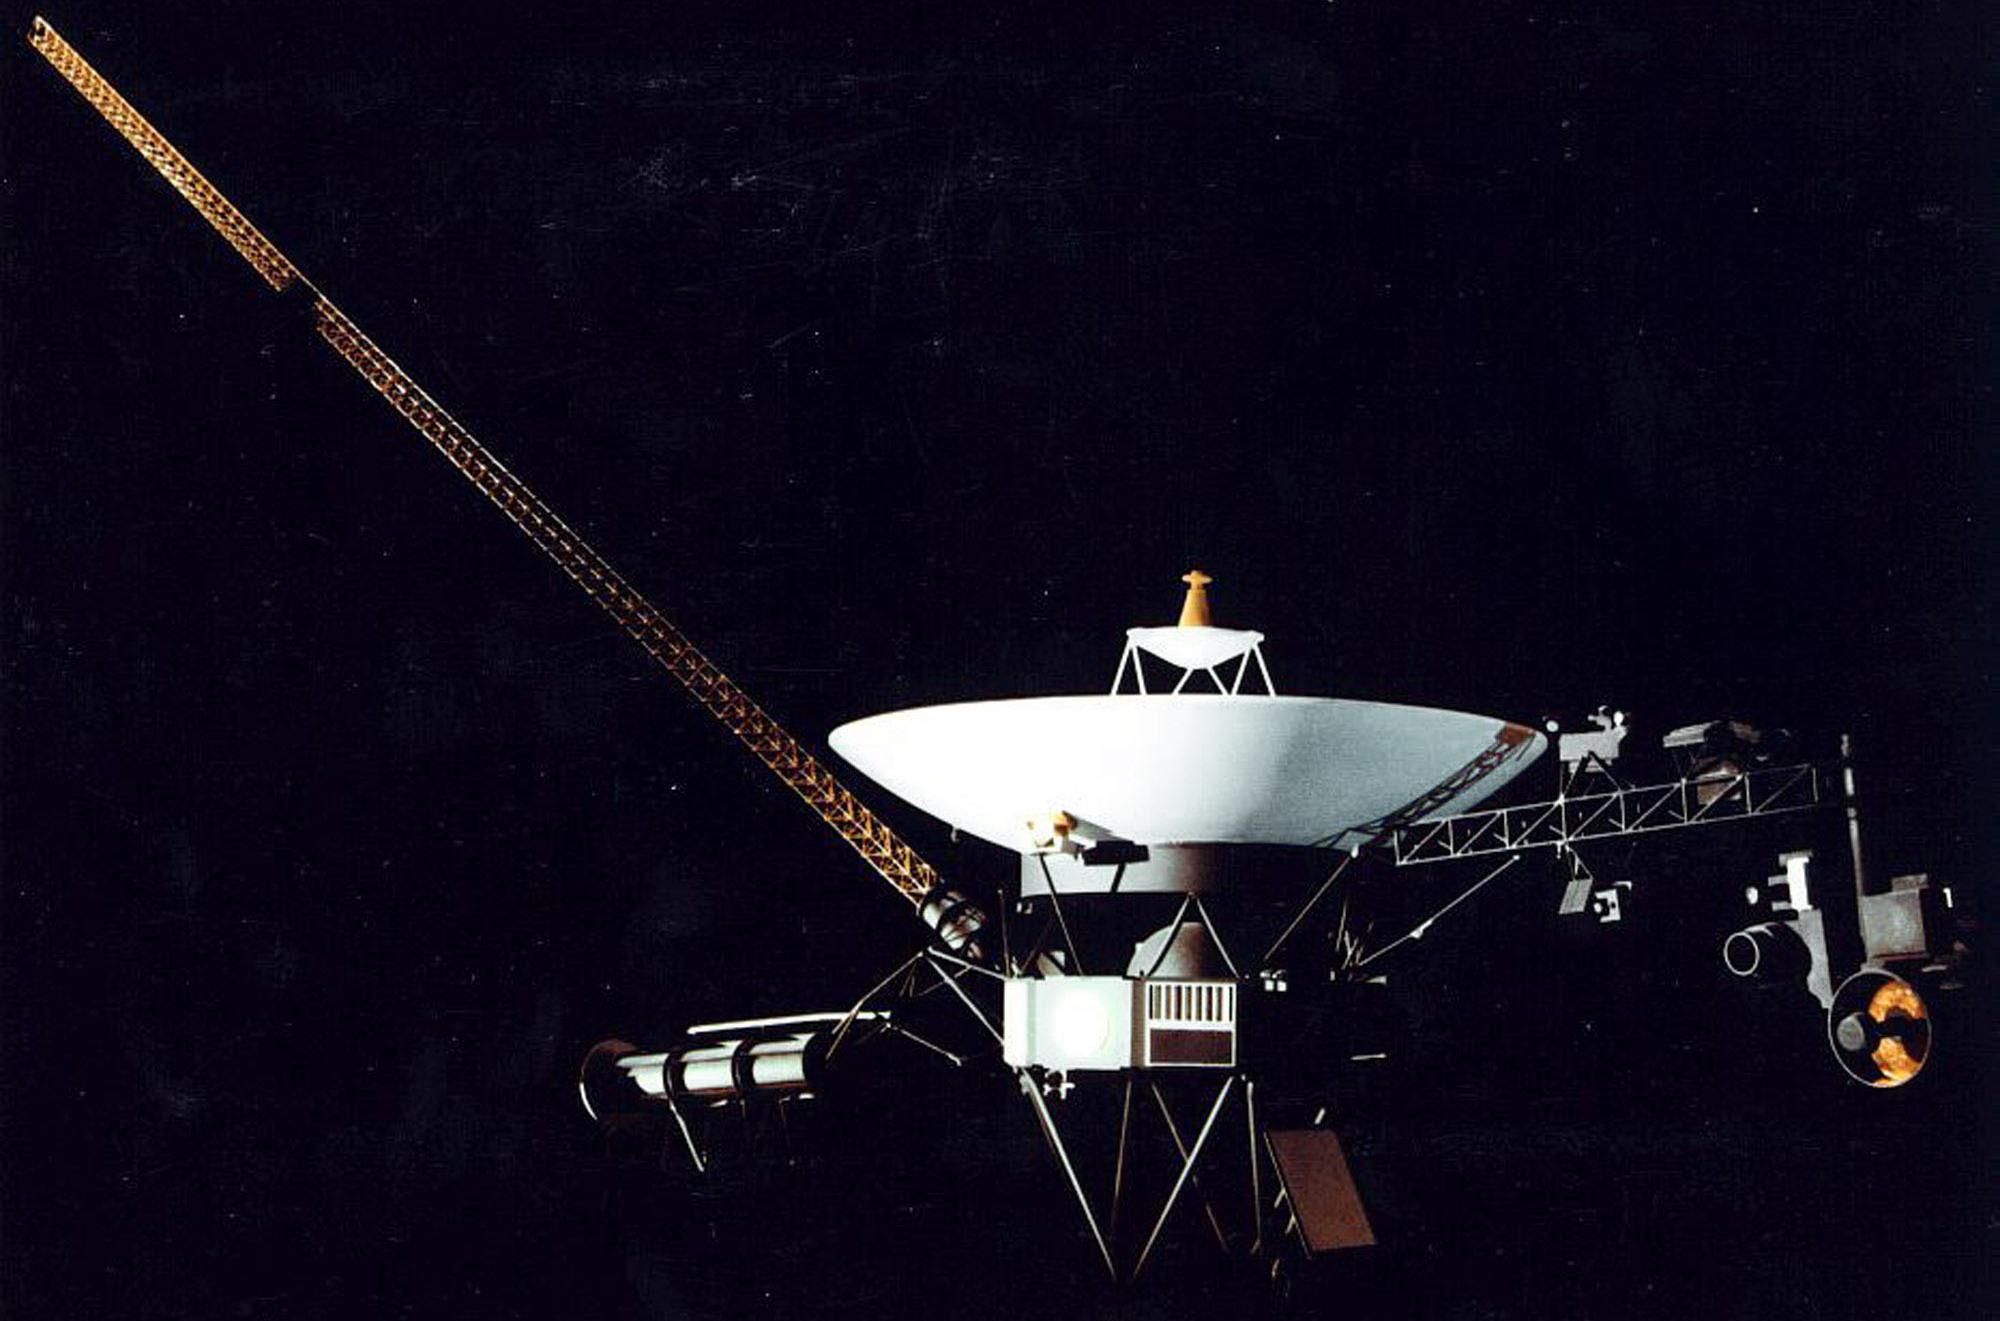 See Ya, Voyager: Probe Has Finally Entered Interstellar Space.